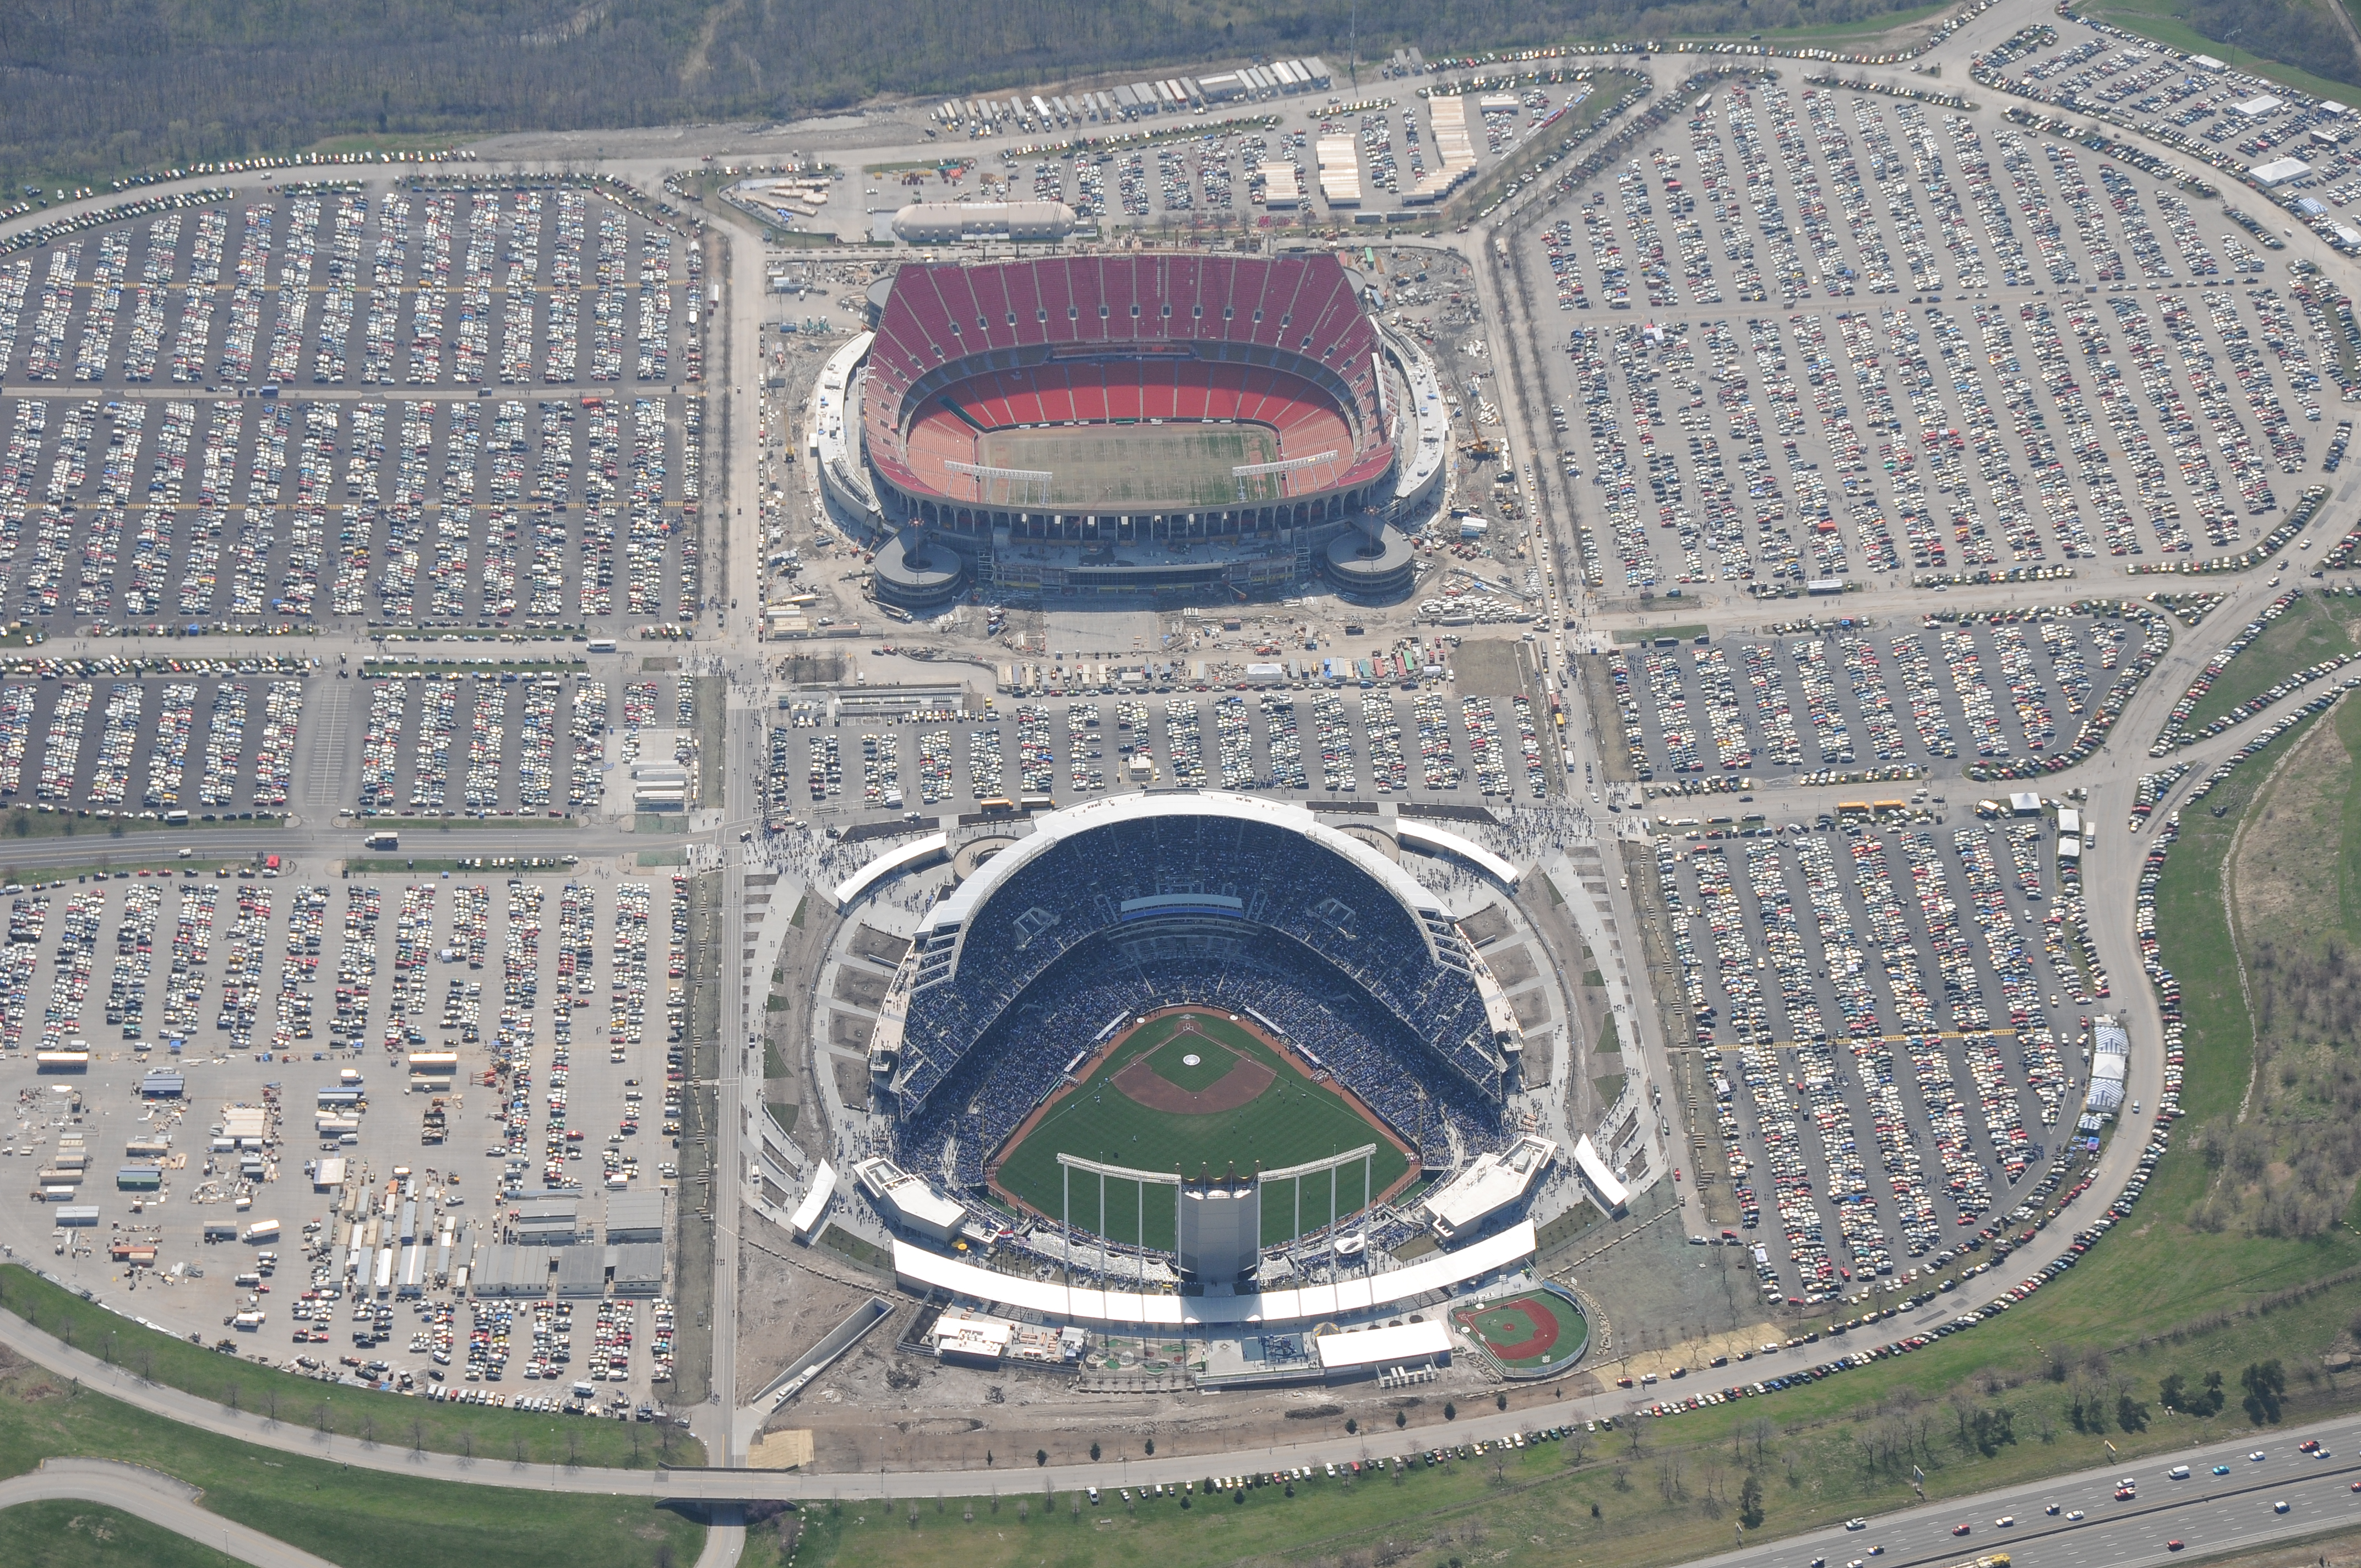 Reviewing arguments against stadium subsi s